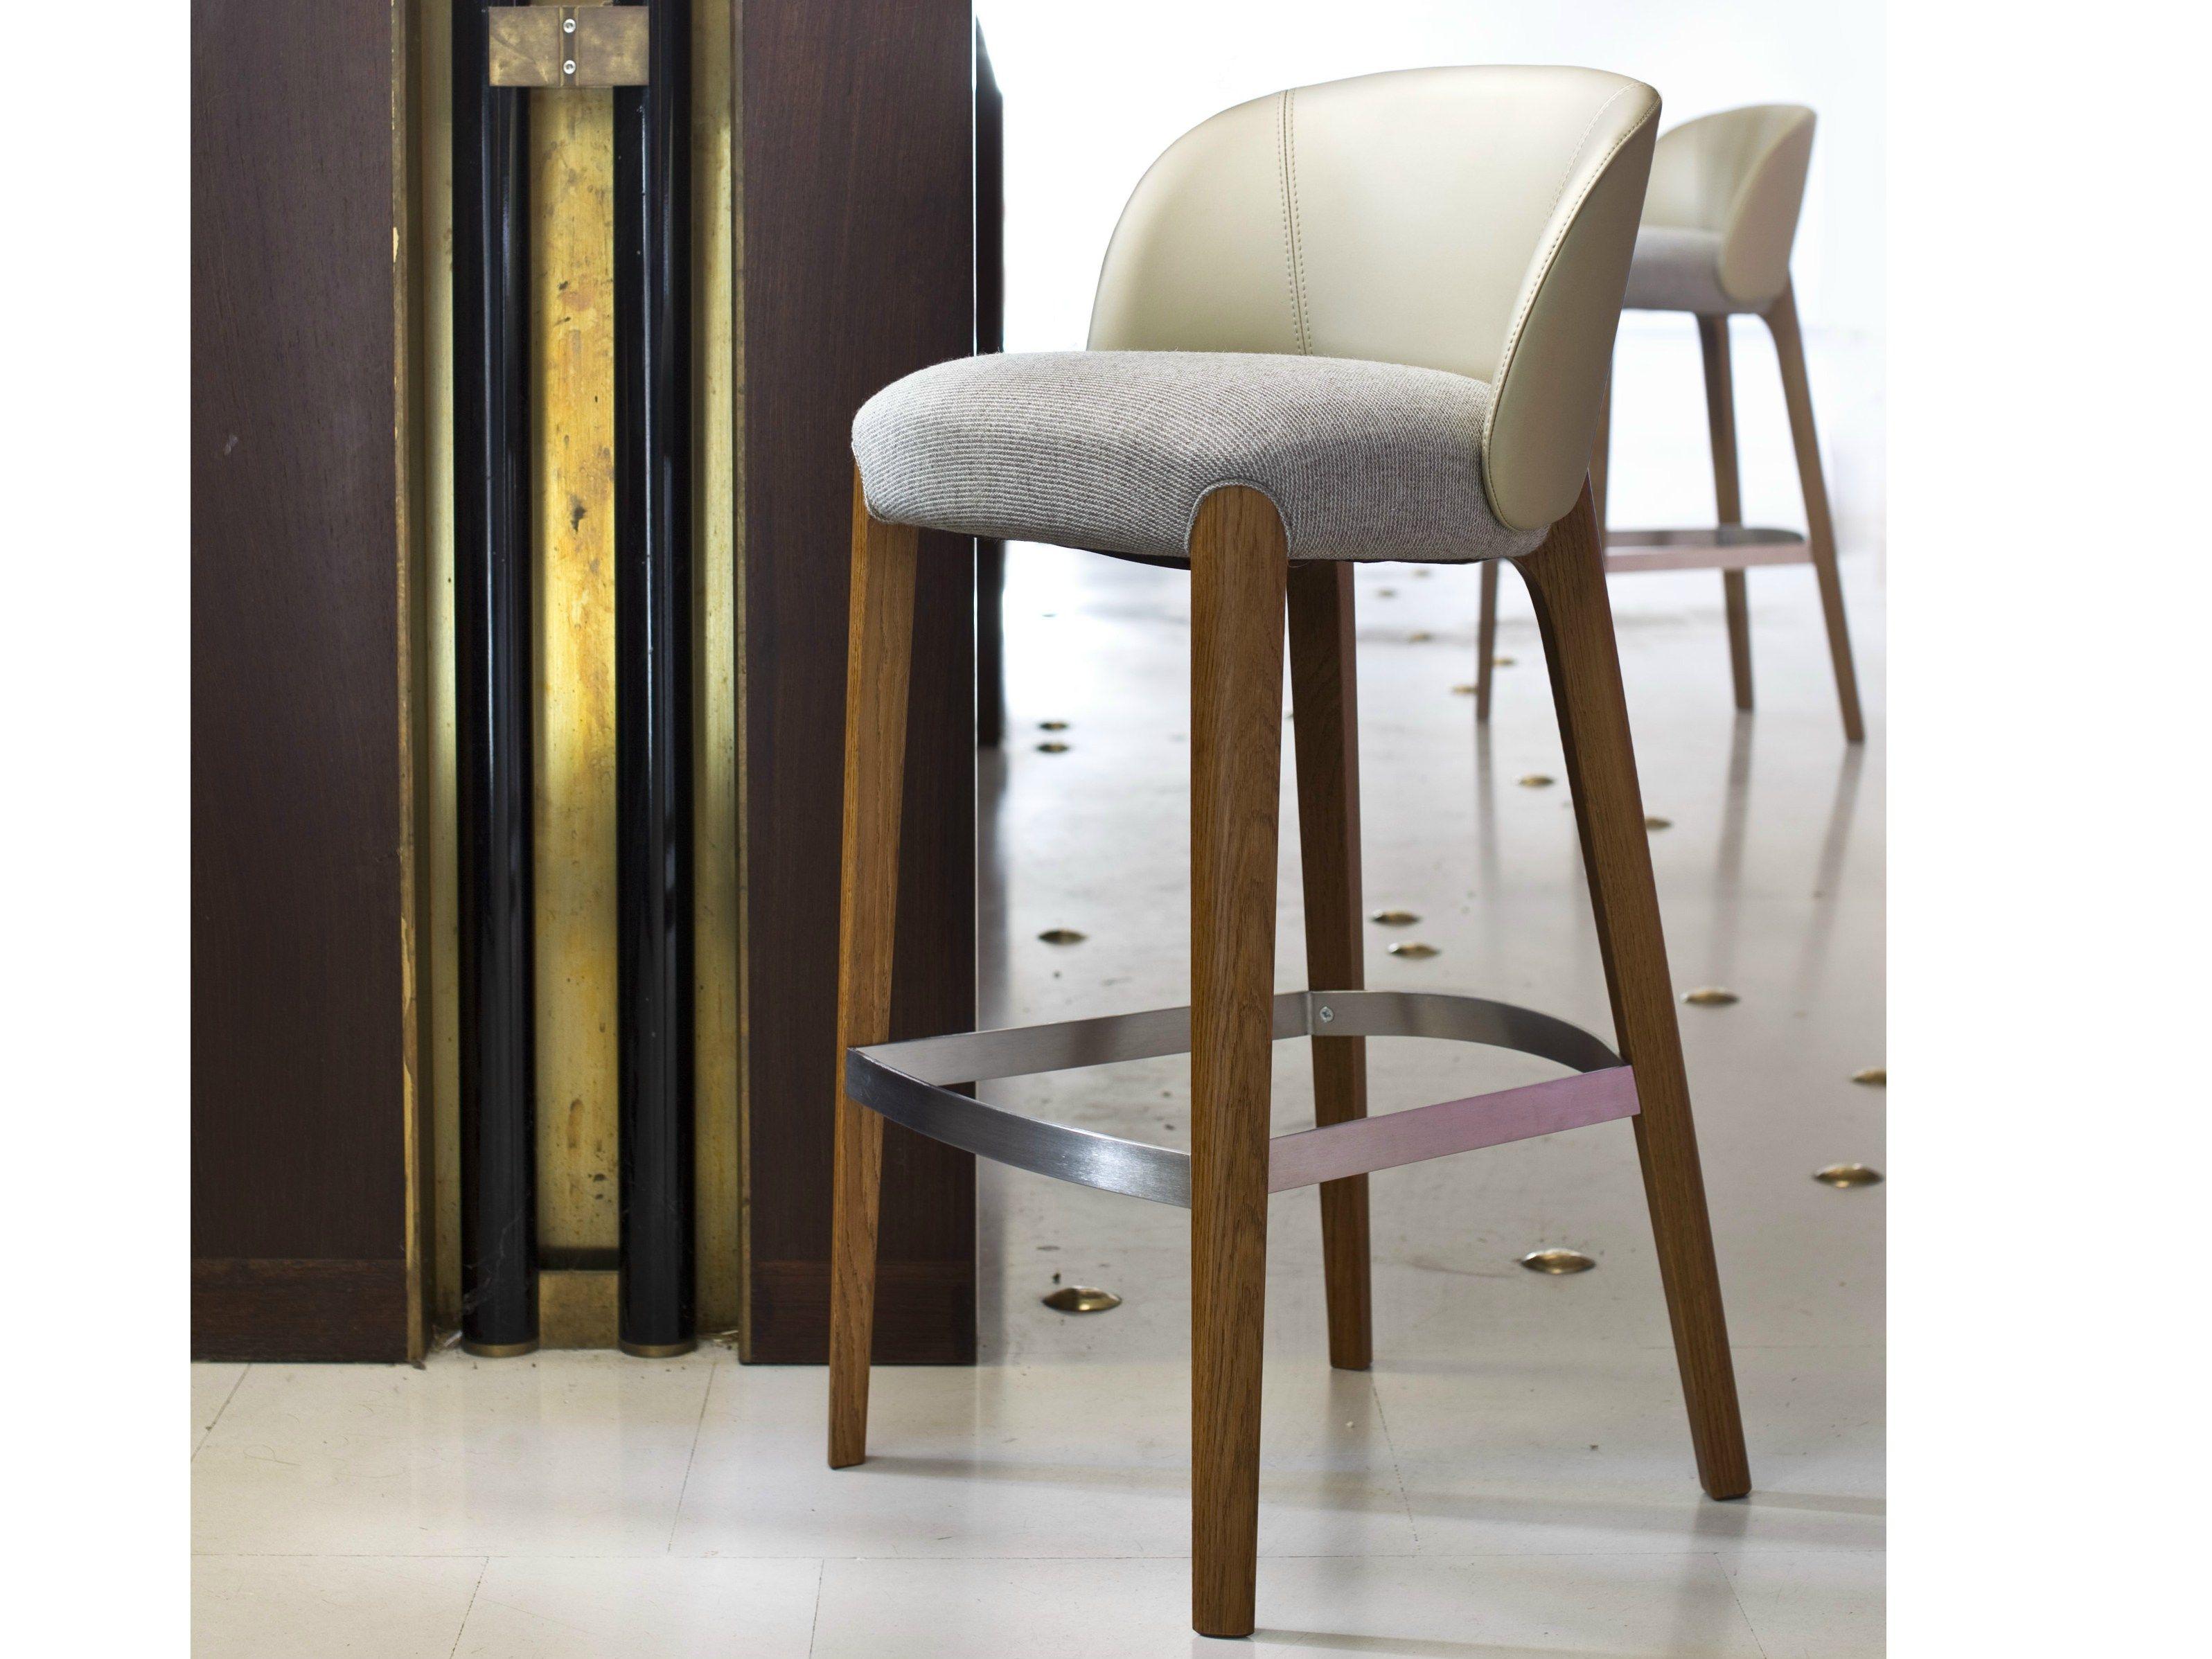 elegance and comfort upholstered bar stools  httpwwwronmowers  - elegance and comfort upholstered bar stools  httpwwwronmowerscom